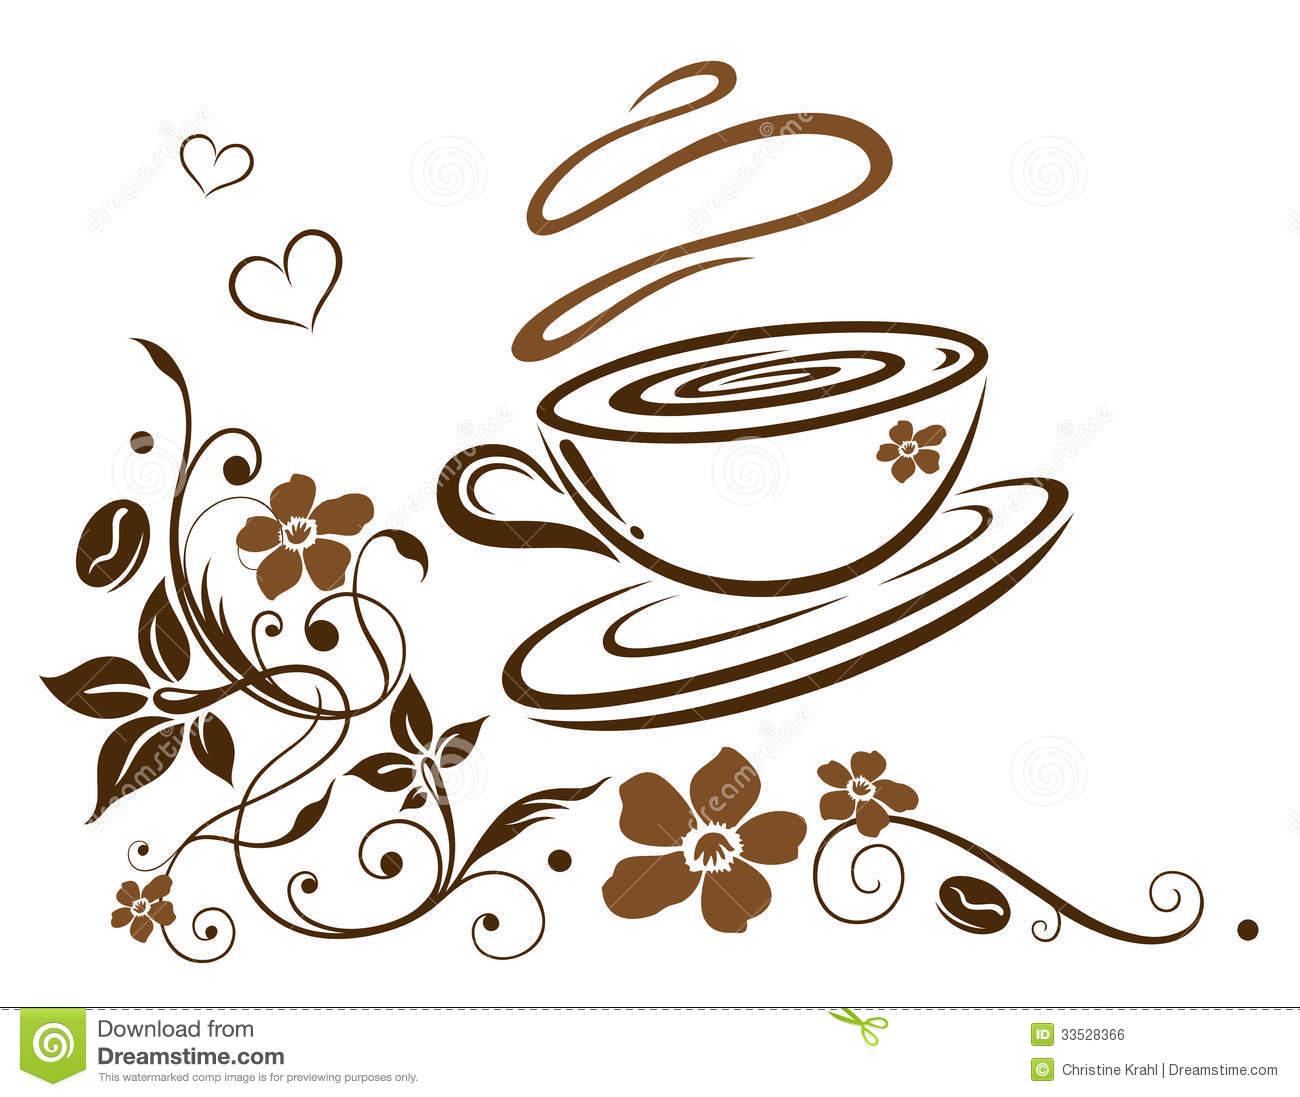 Free download Coffee Cup Border Clip Art Foto Artis.